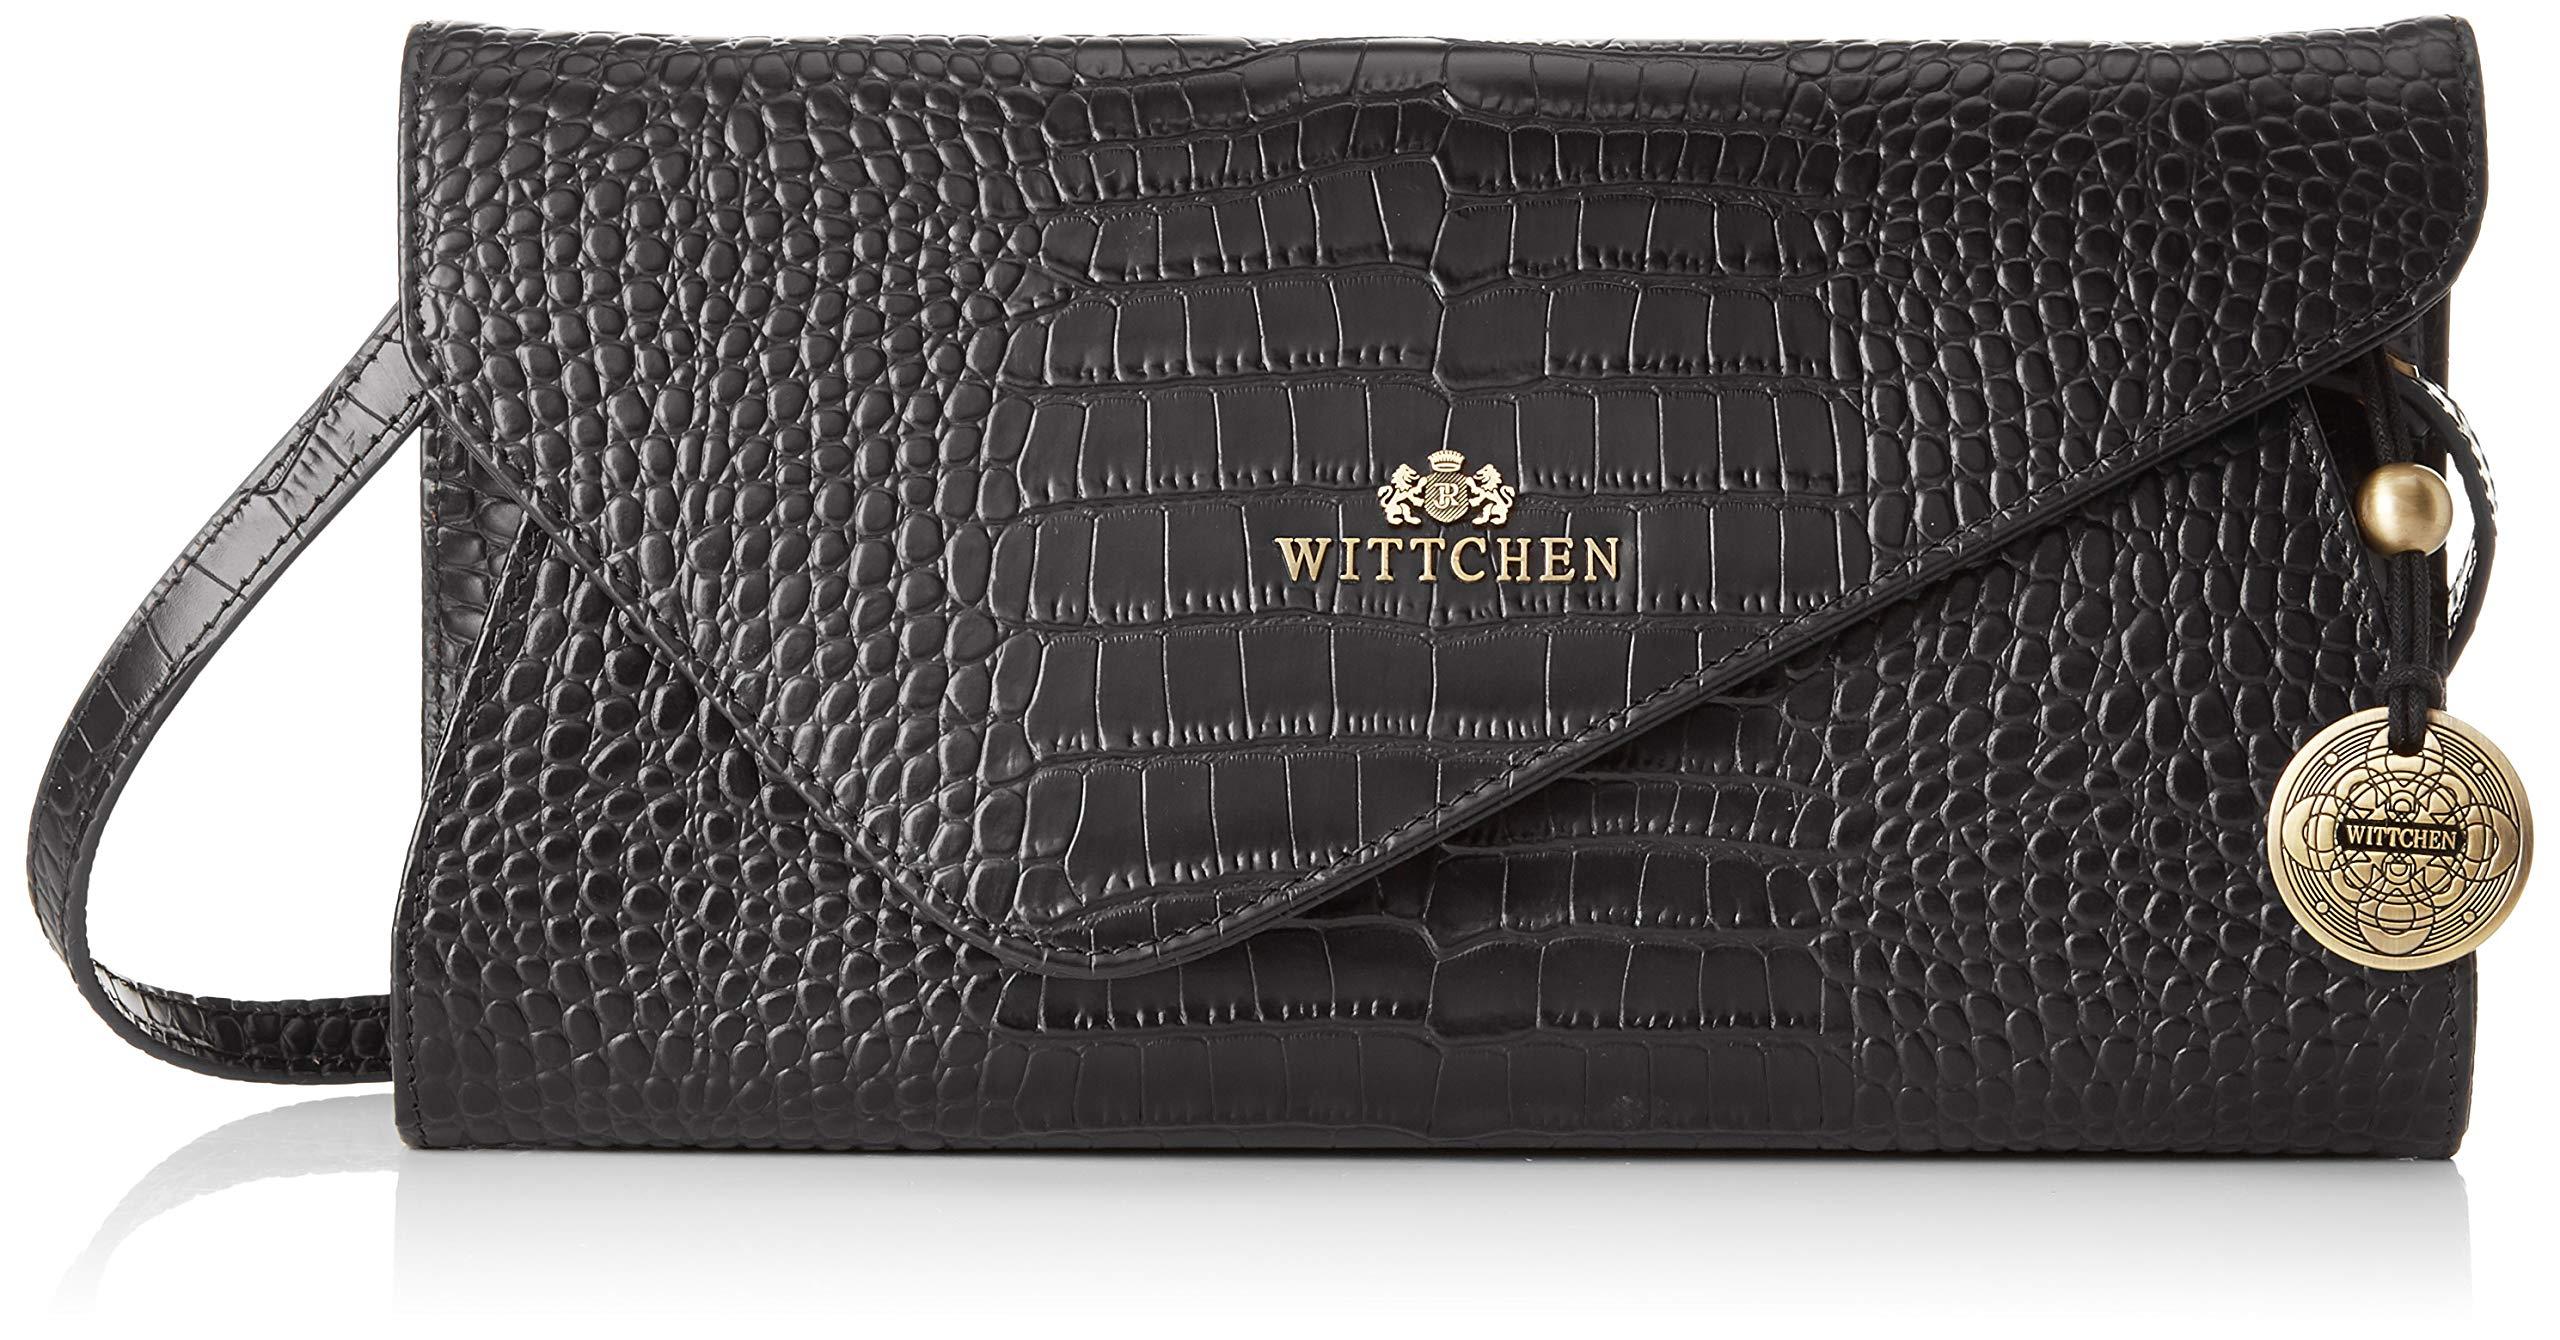 Klein WittchenPochette Pour Pour Noir Femme WittchenPochette qjLc354RSA